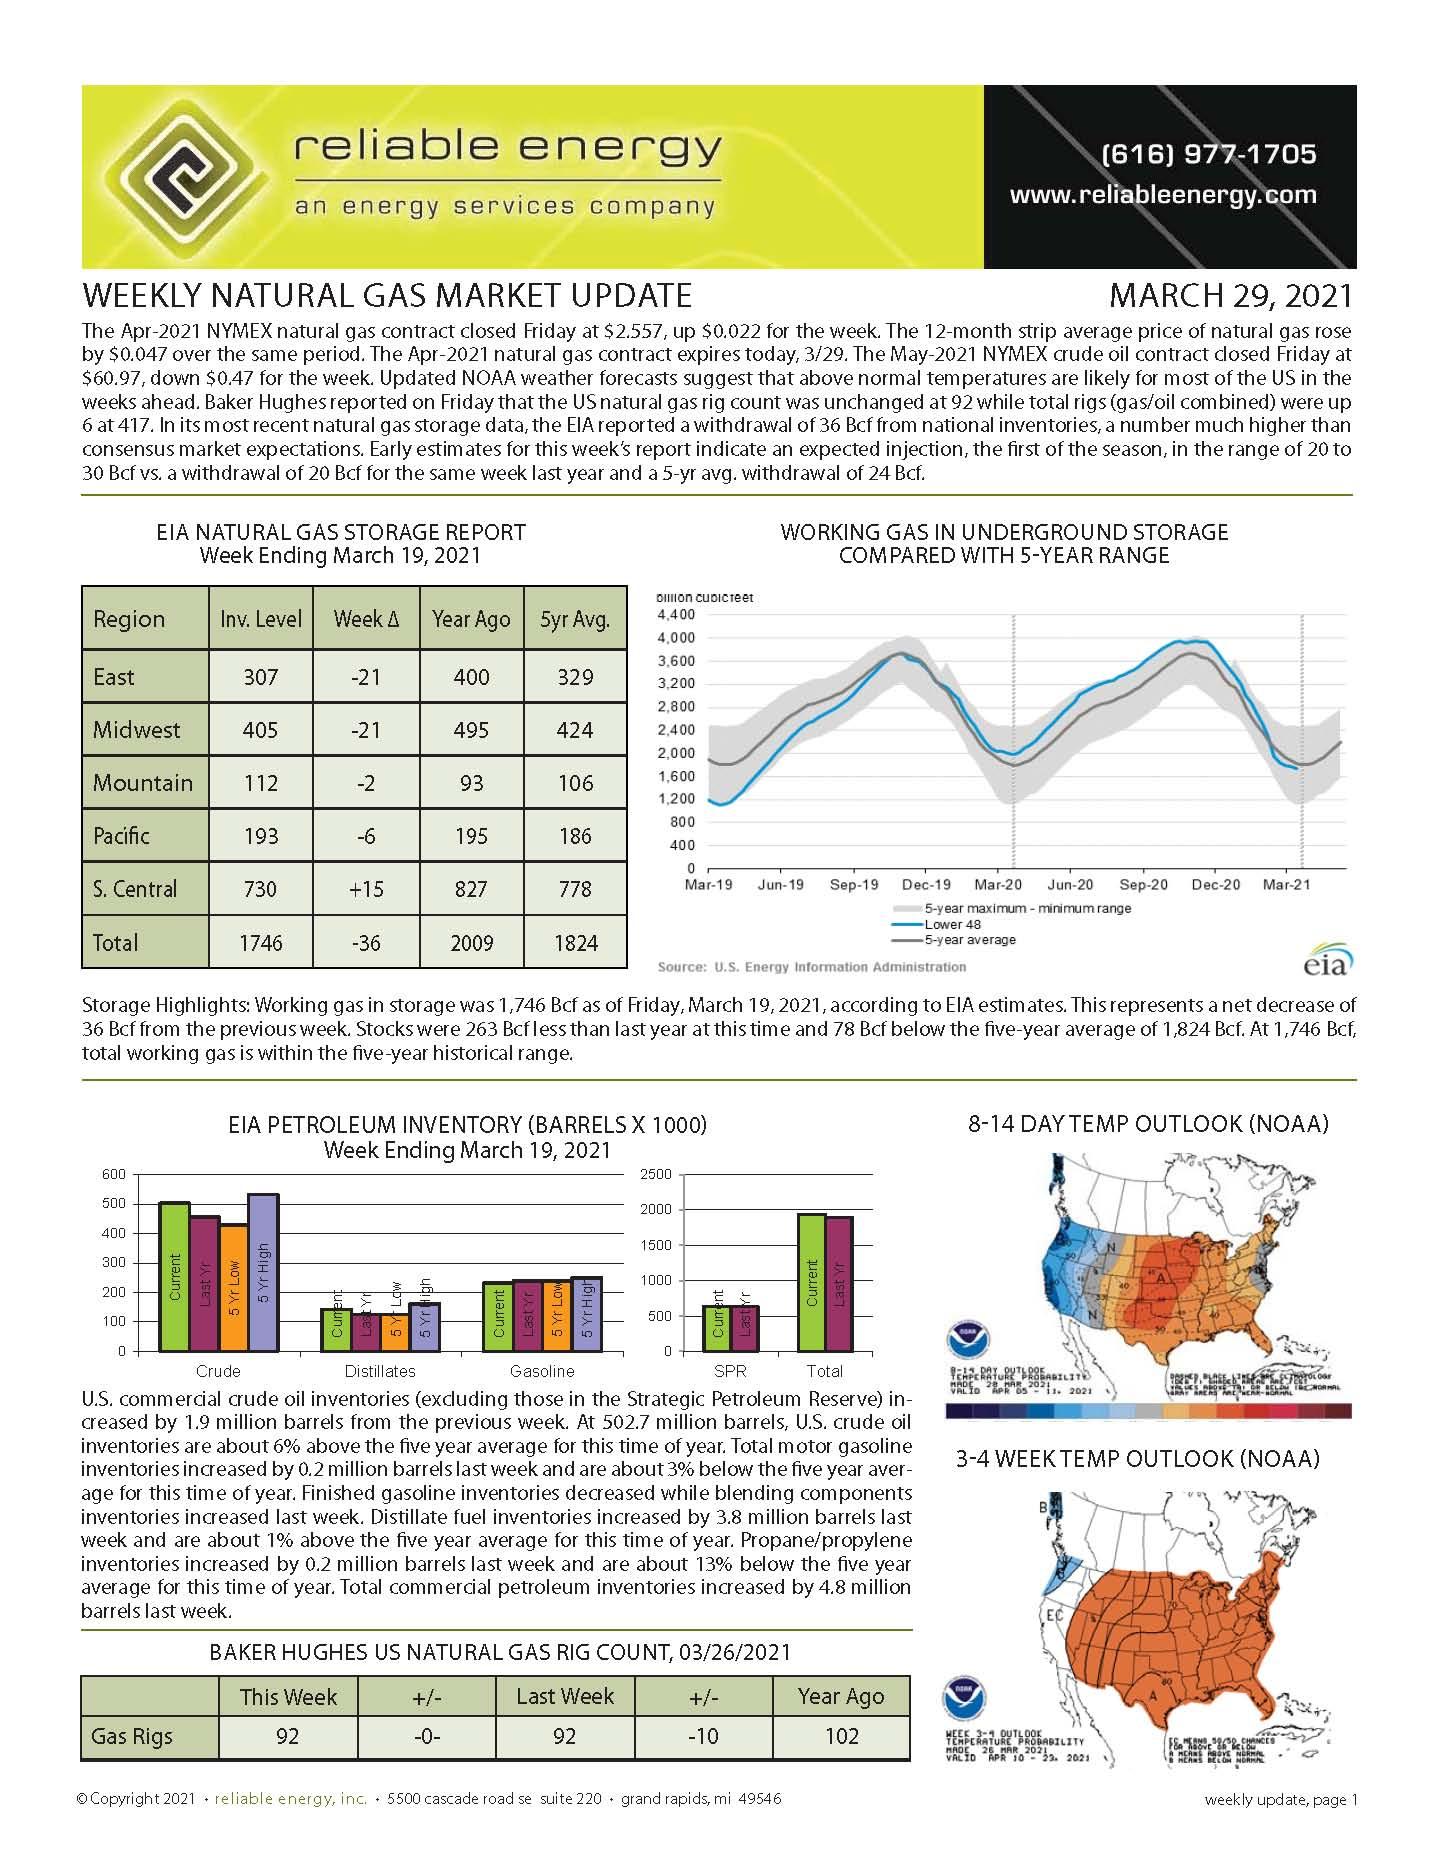 Natural Gas Market Update – March 29, 2021